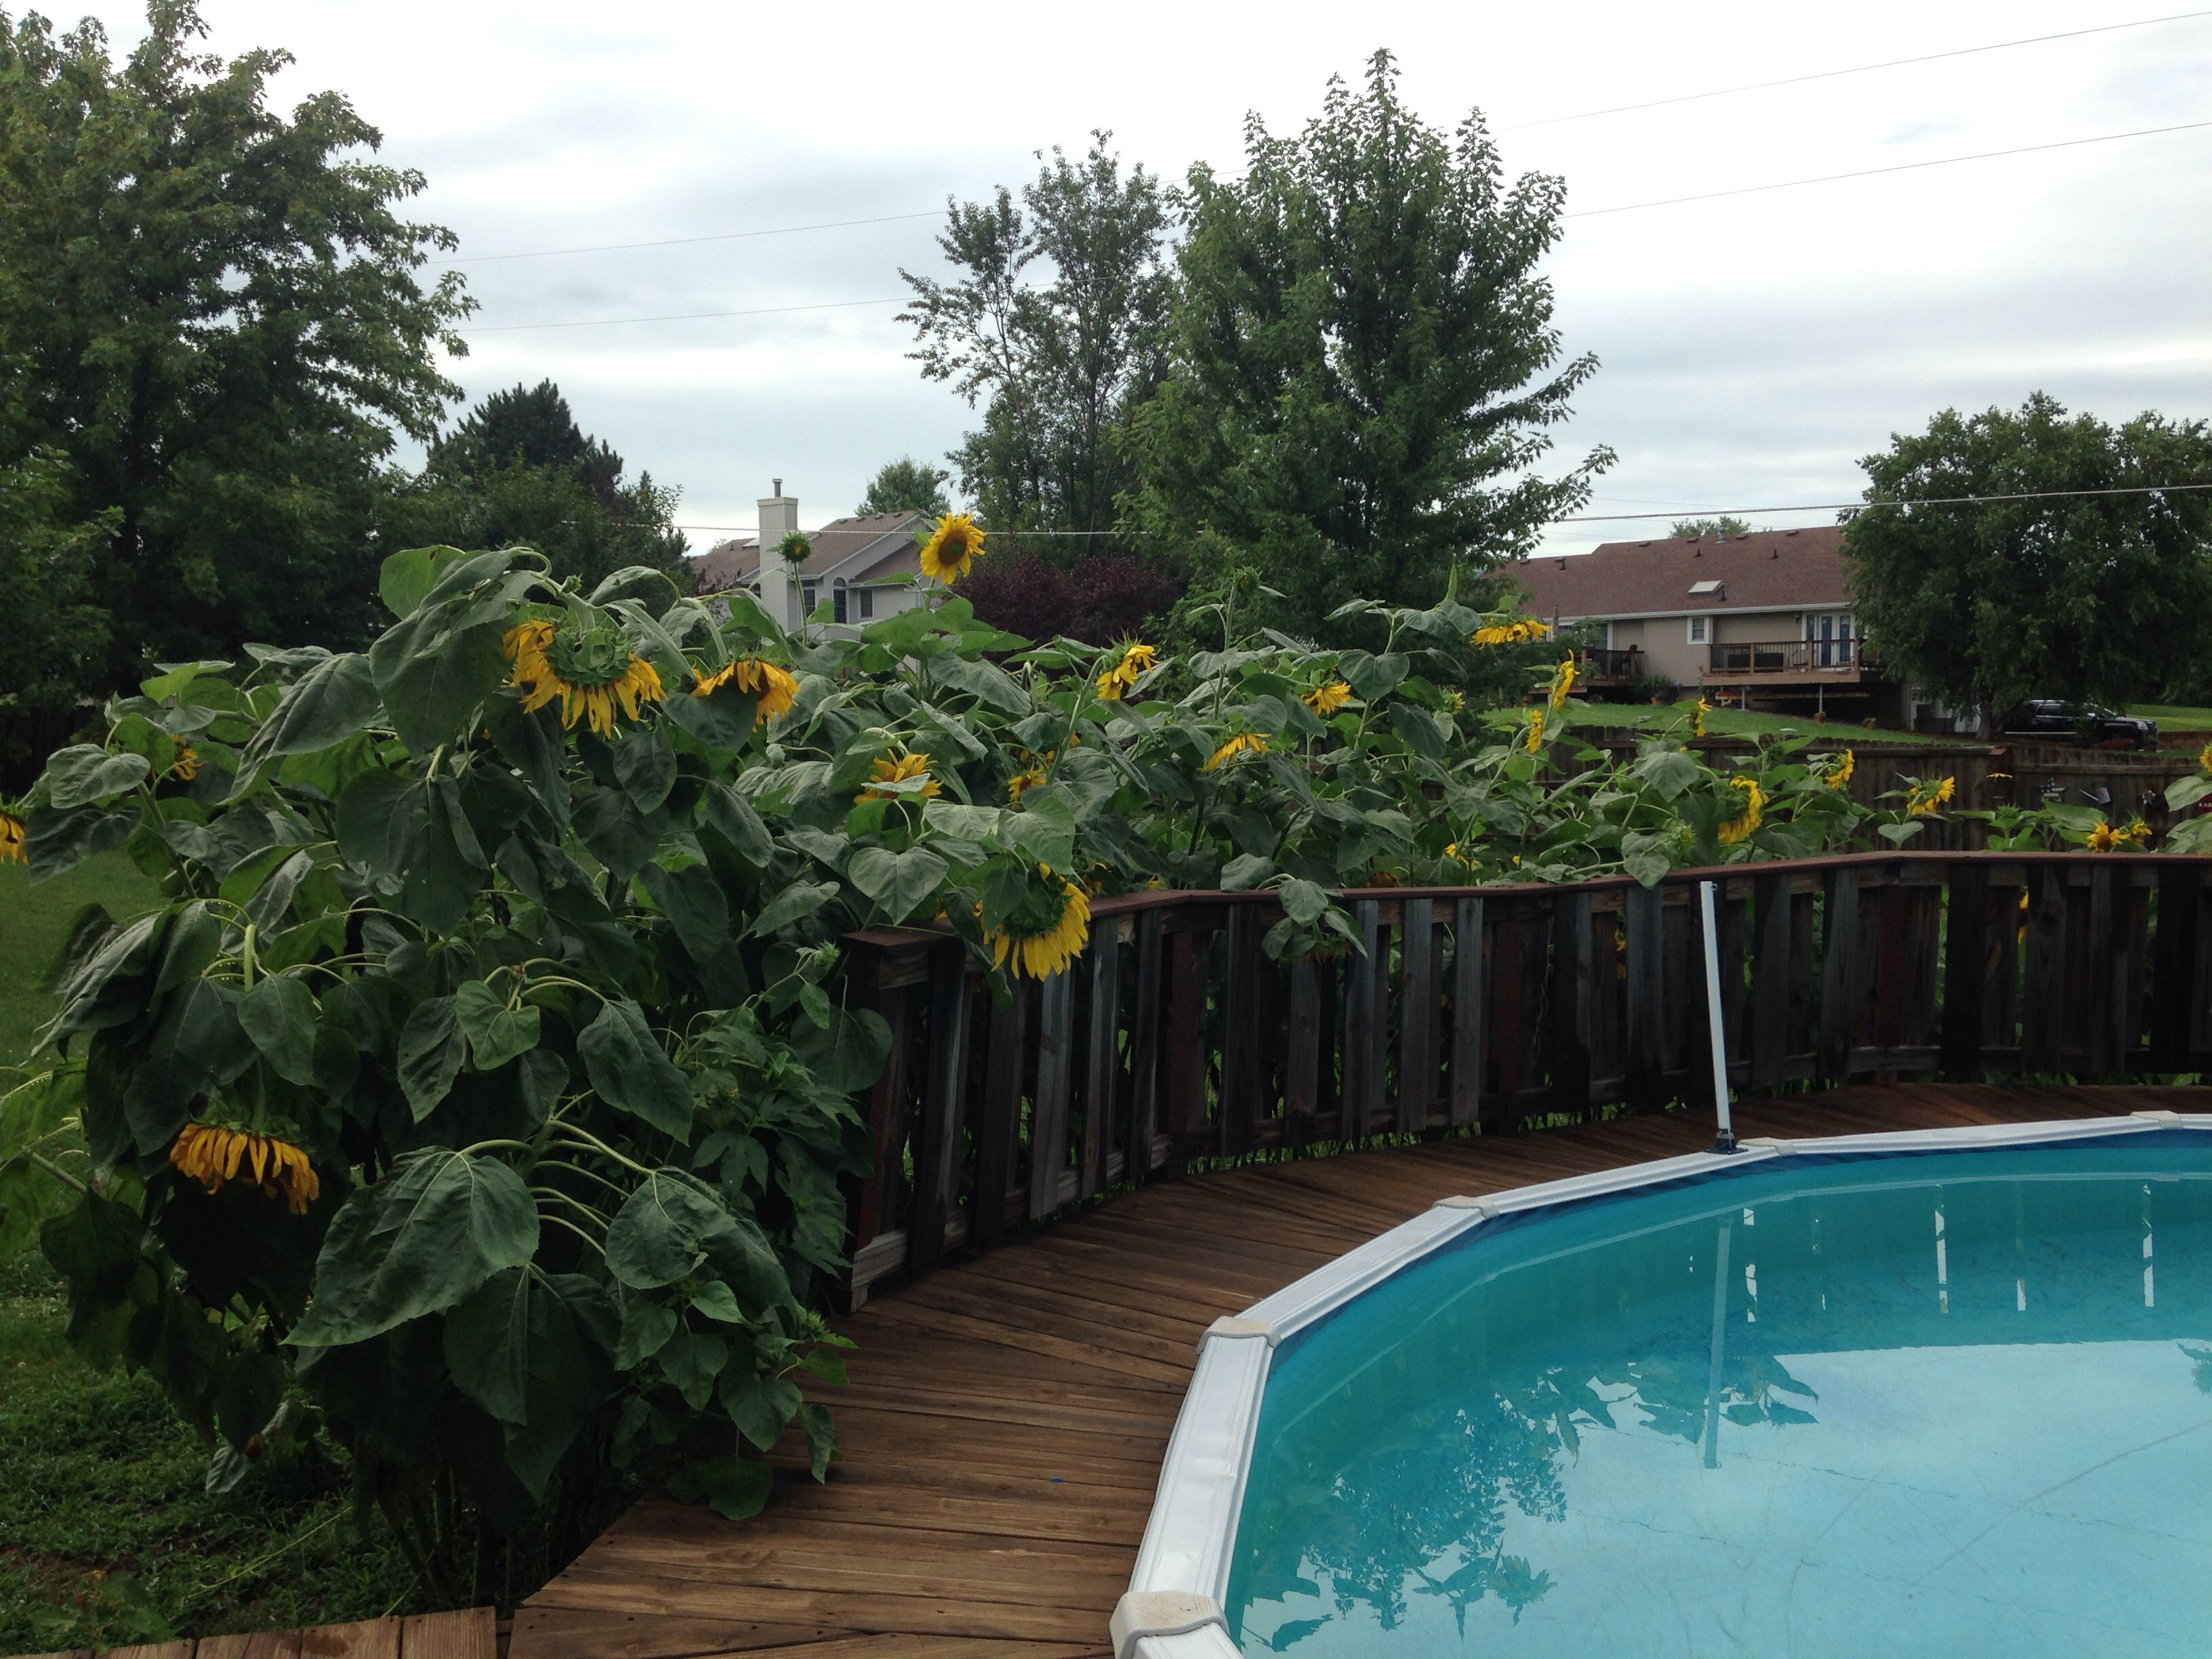 mammoth sunflowers for privacy gardening pinterest mammoth